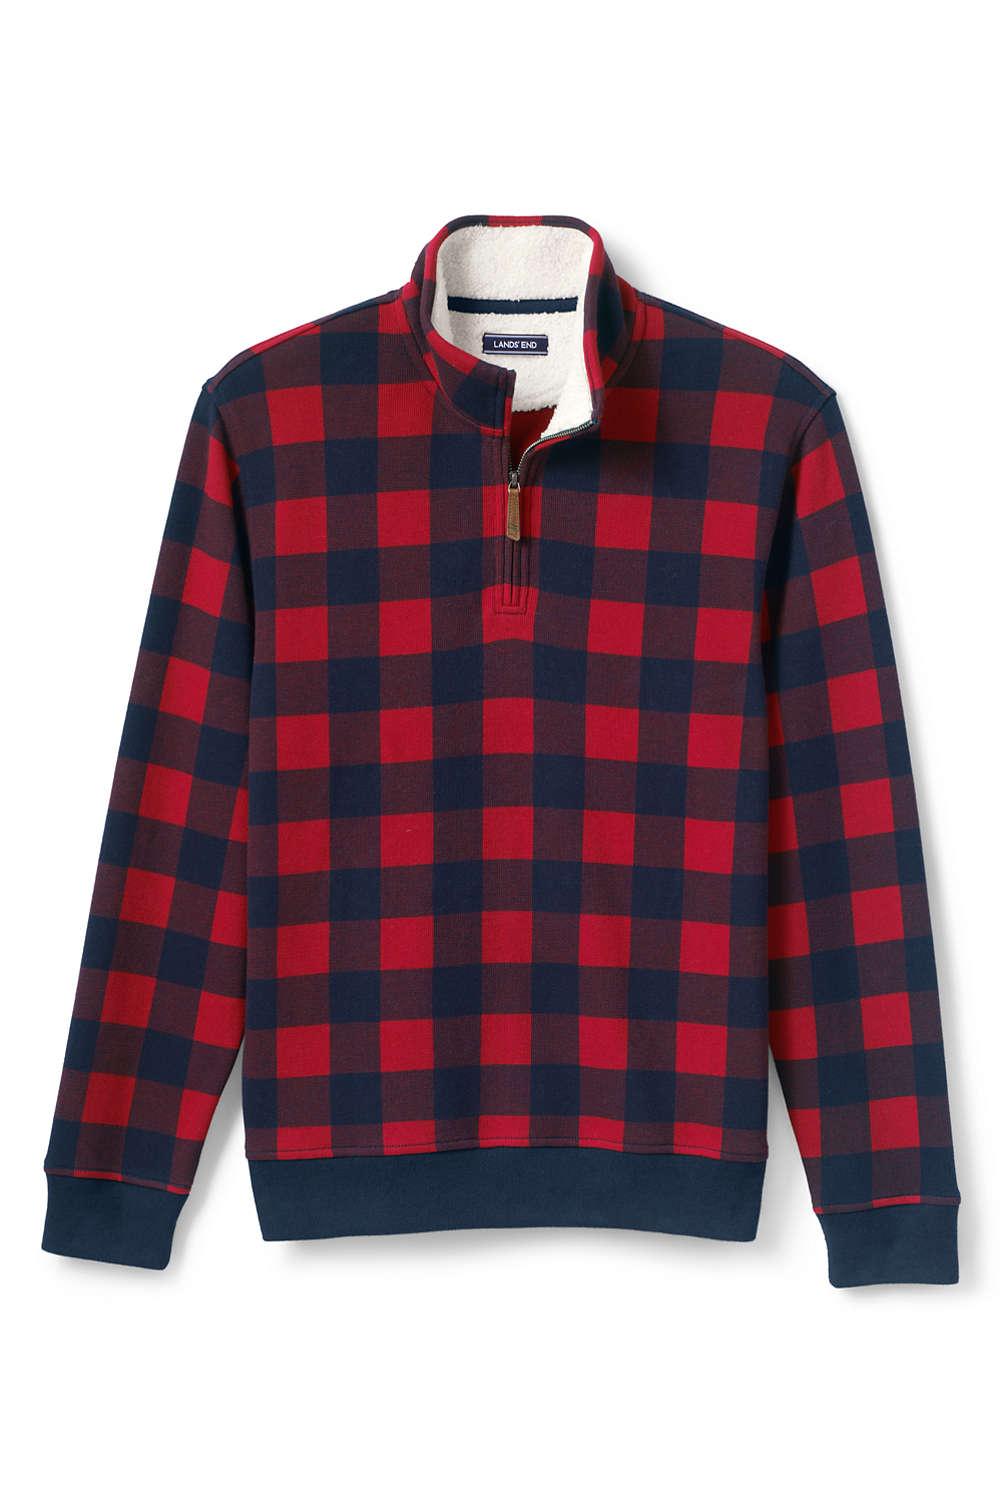 802378614d463 Men s Pattern Bedford Rib Quarter Zip Sweater from Lands  End